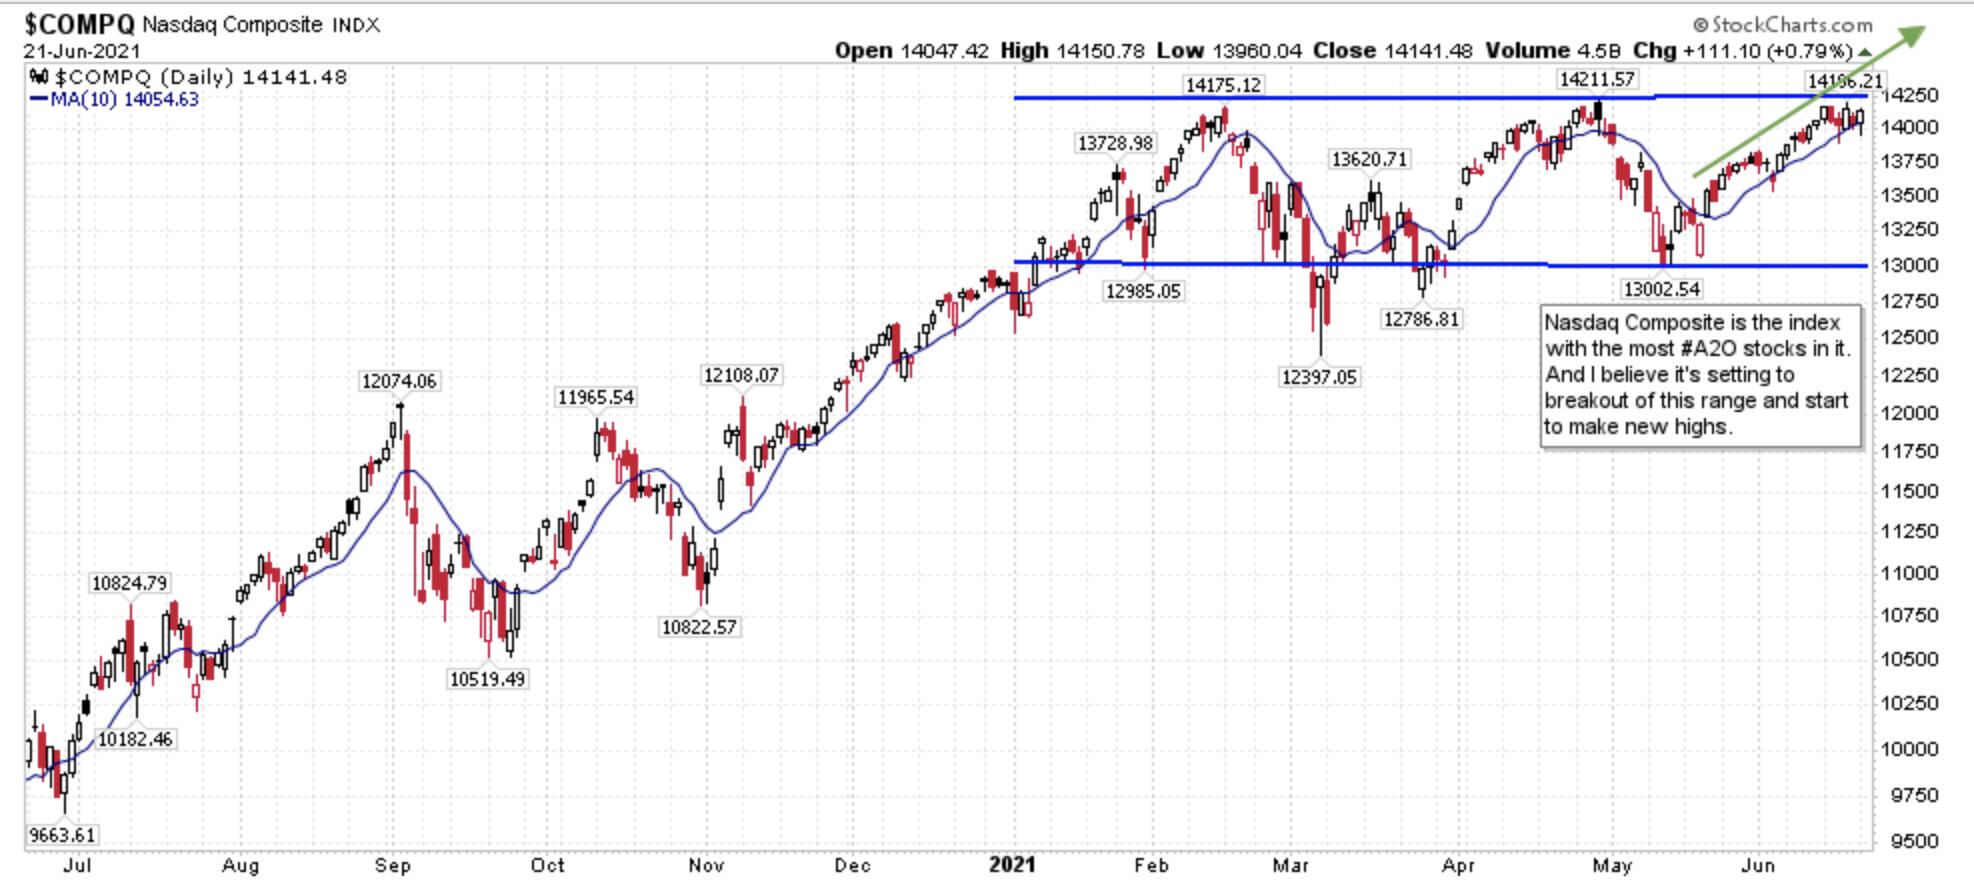 Nasdaq Composite Trading Range Chart